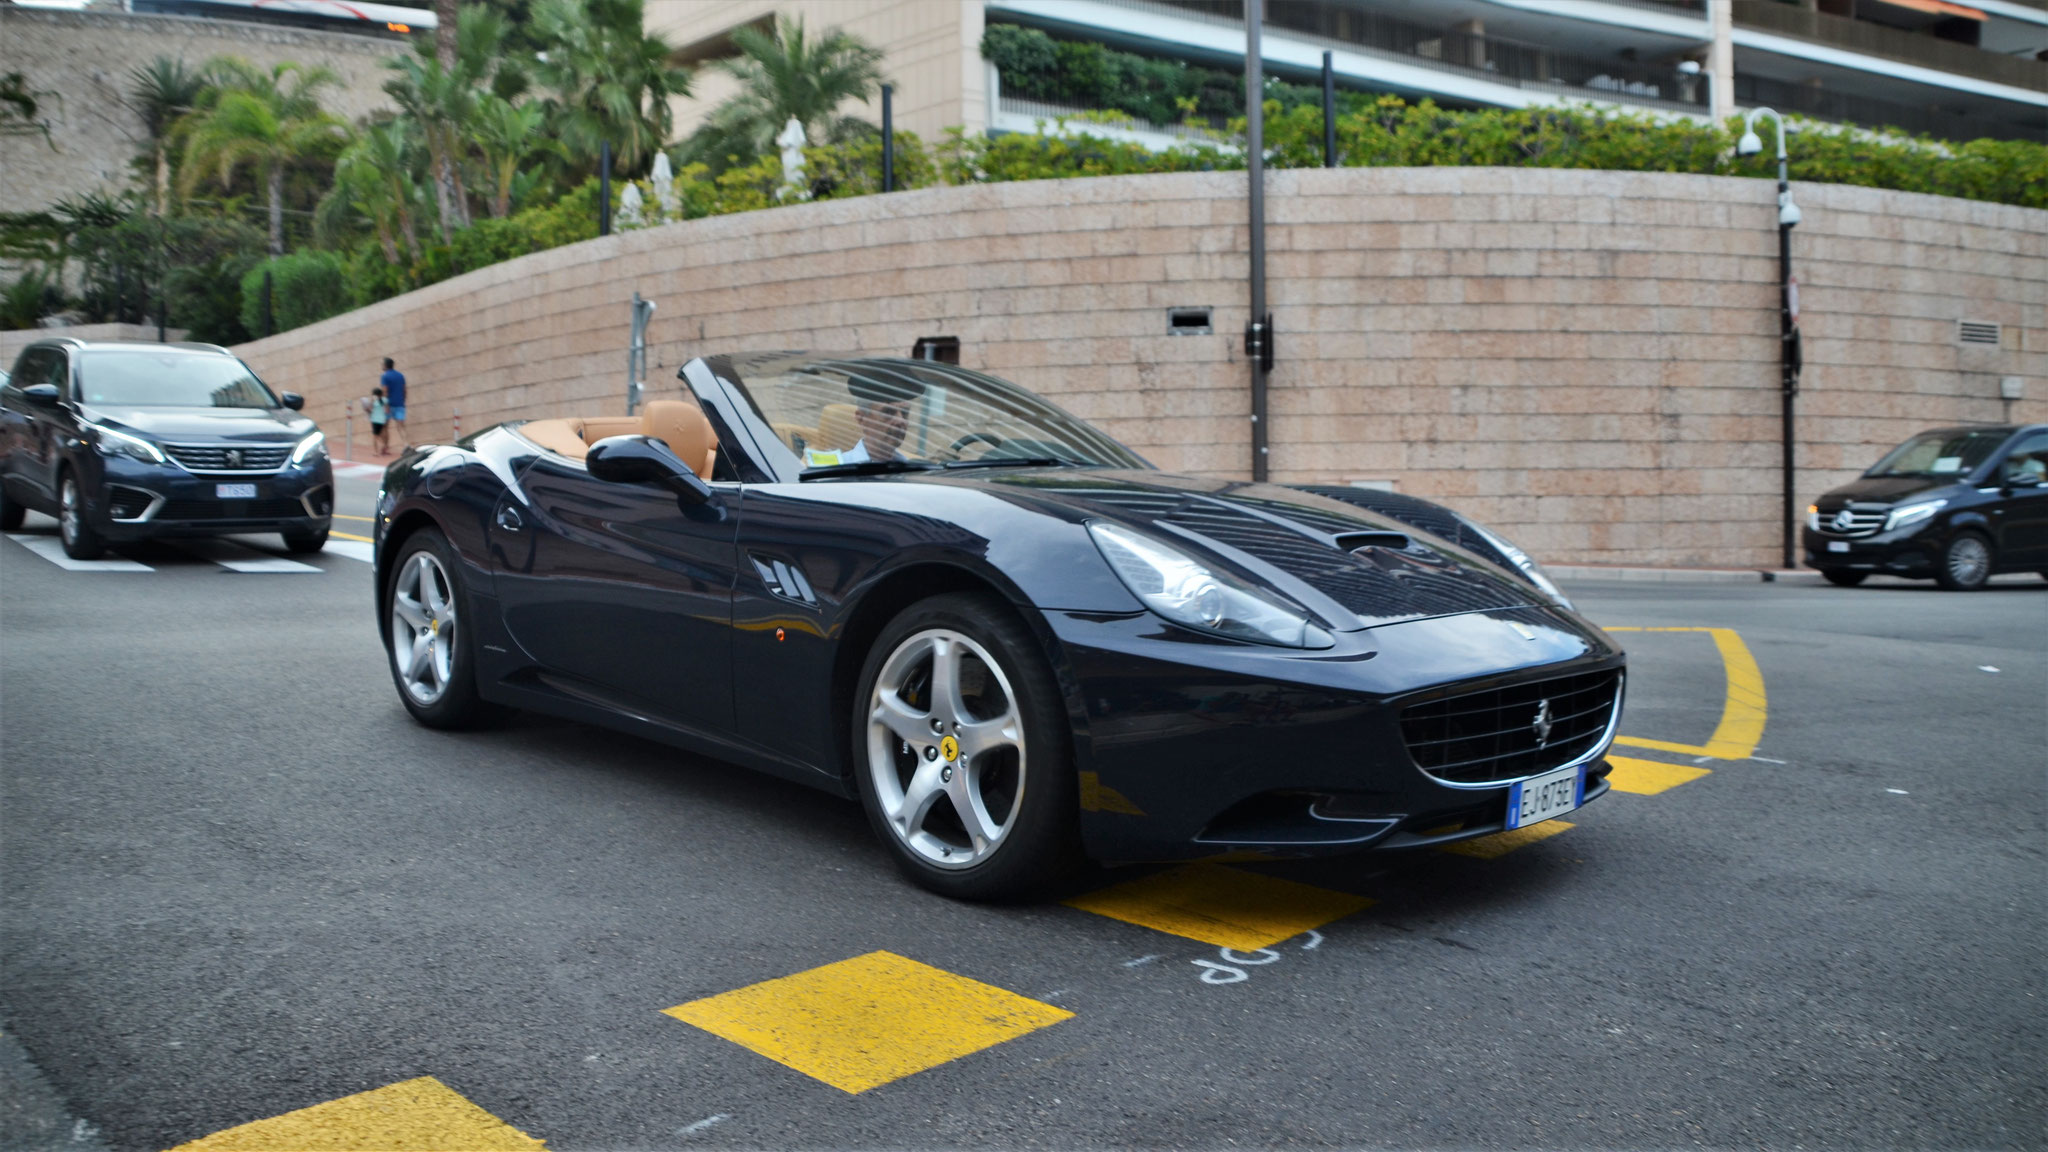 Ferrari California - EJ-873-EY (ITA)